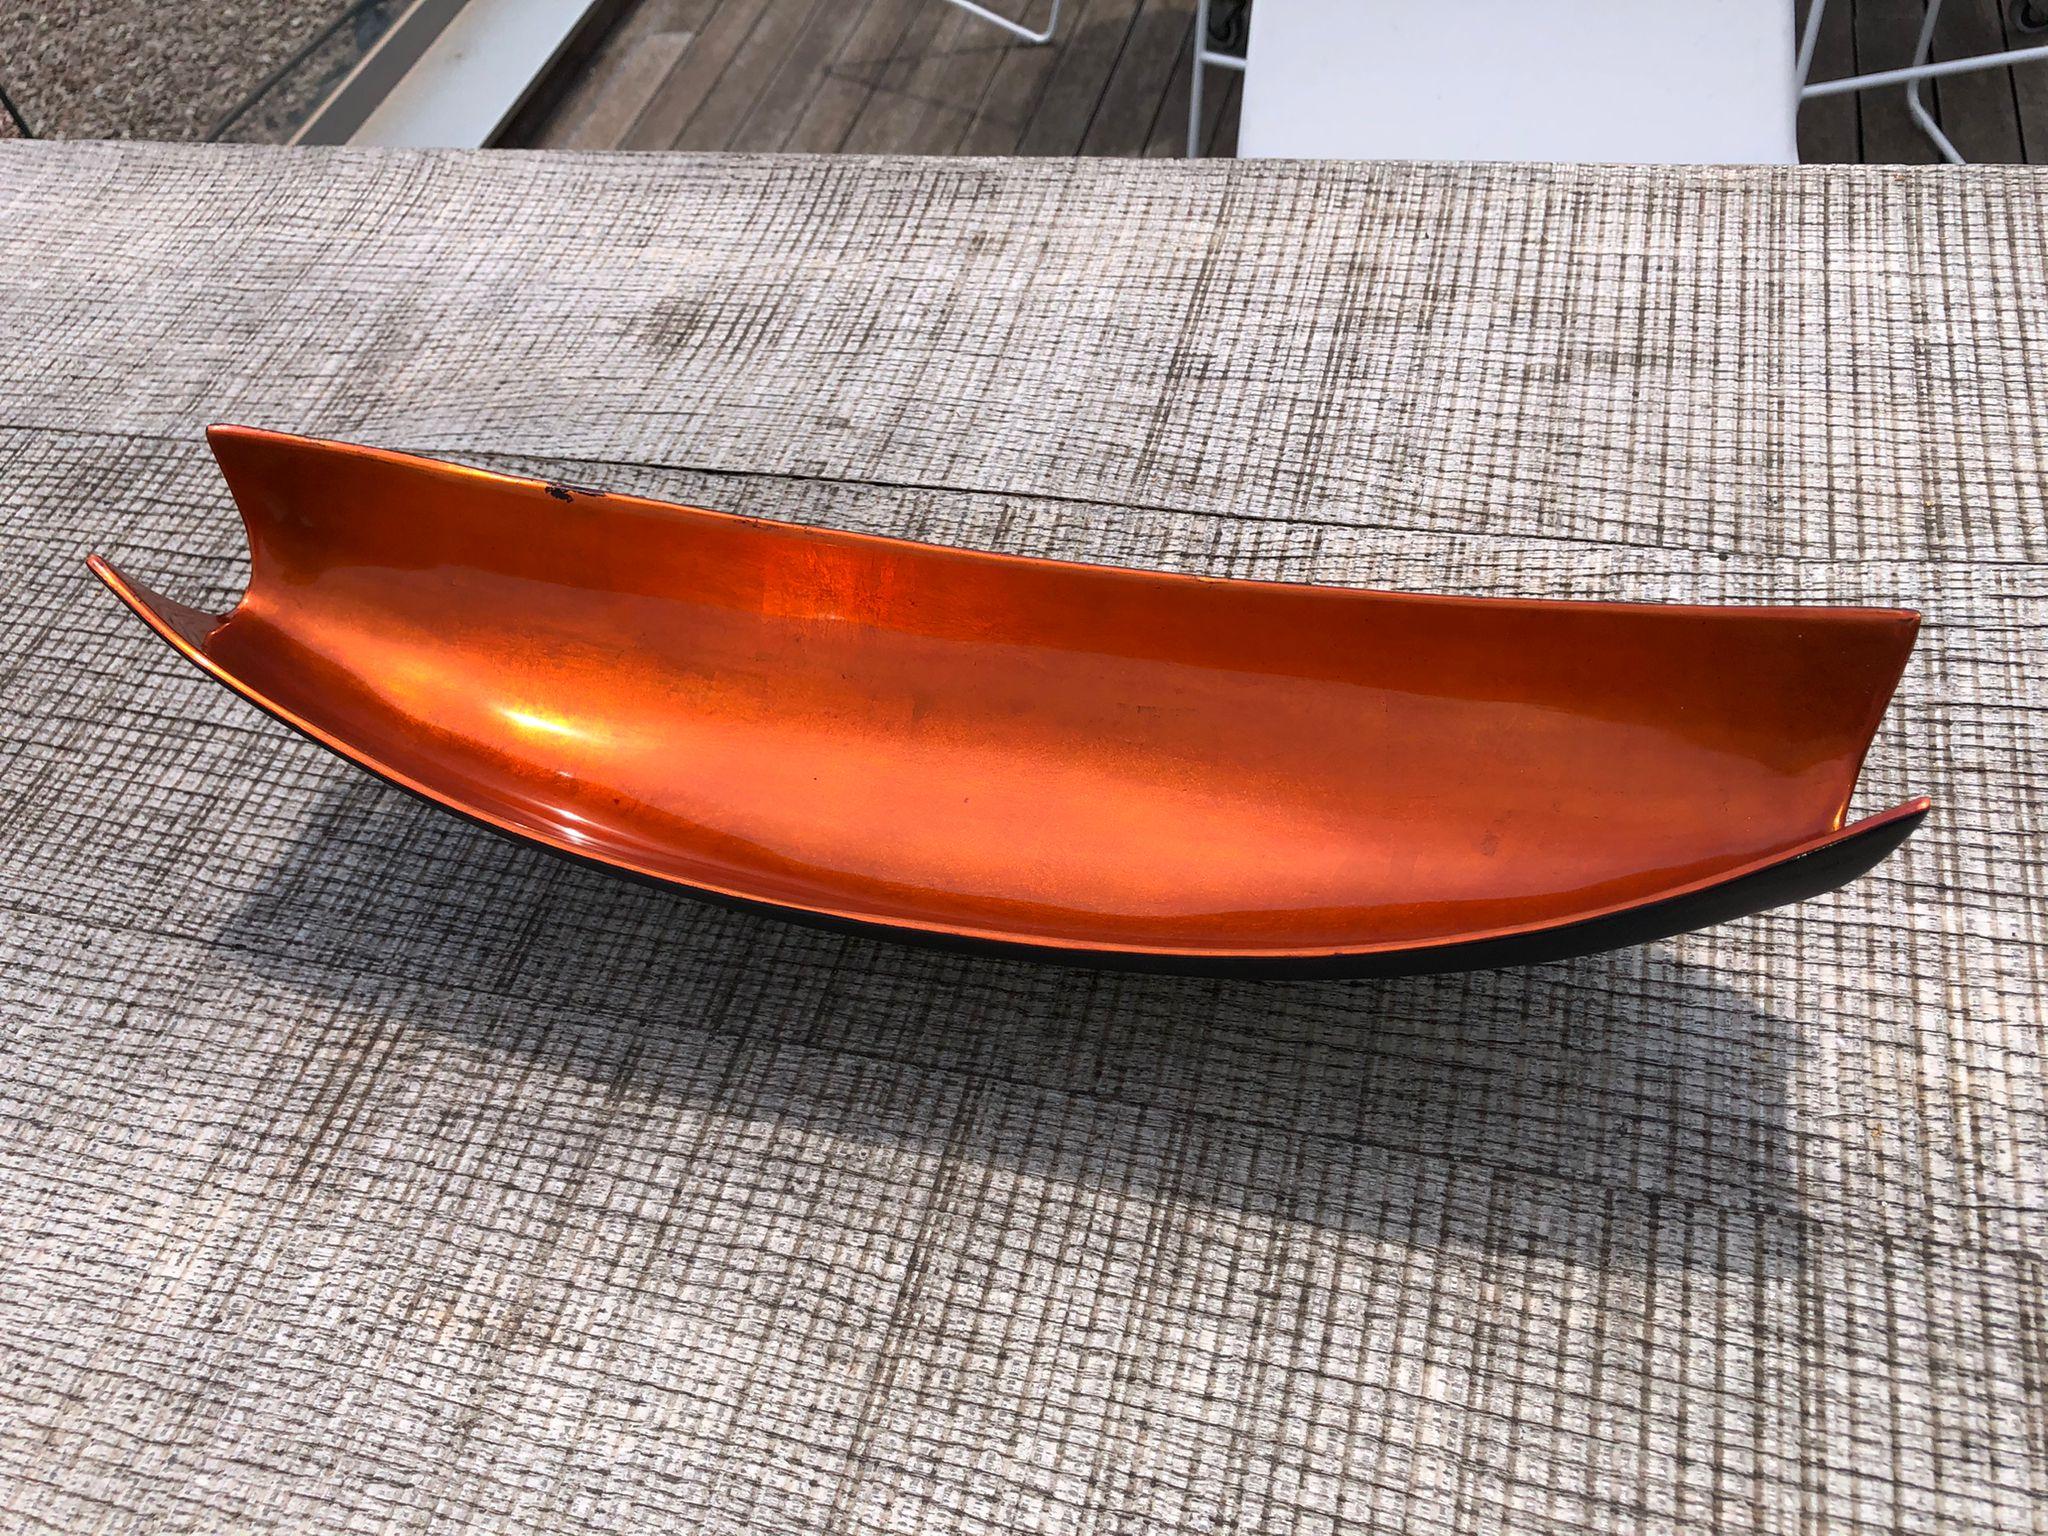 Centro de mesa color naranja